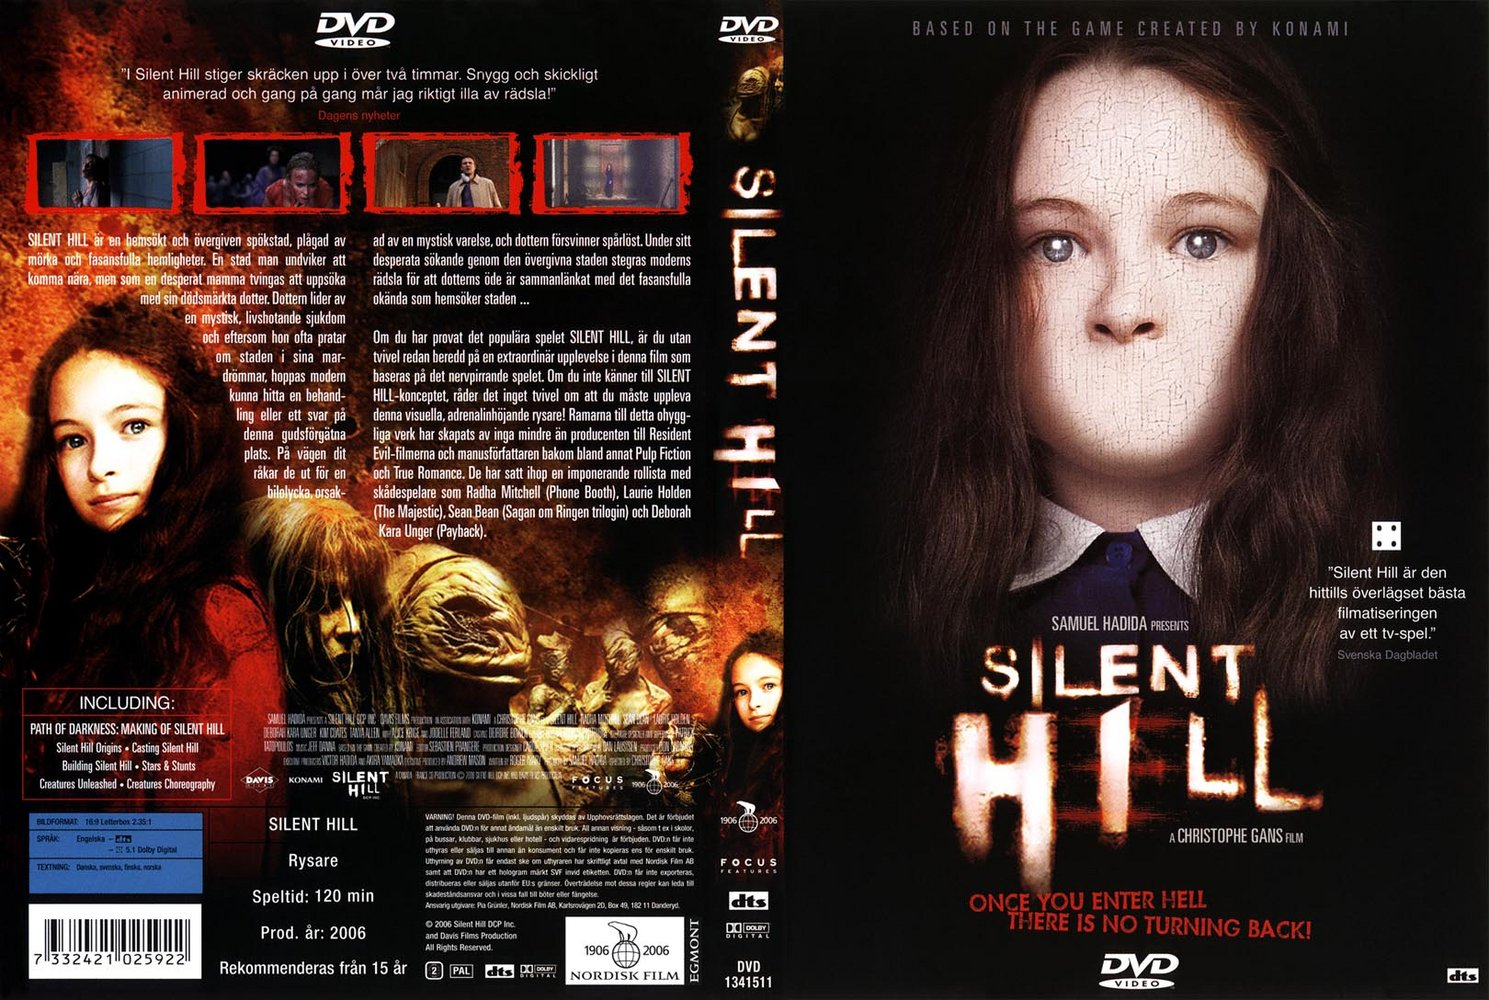 DVD Covers - Silent Hill Swedish - Beautiful Jodelle Image & Media ... Dvd